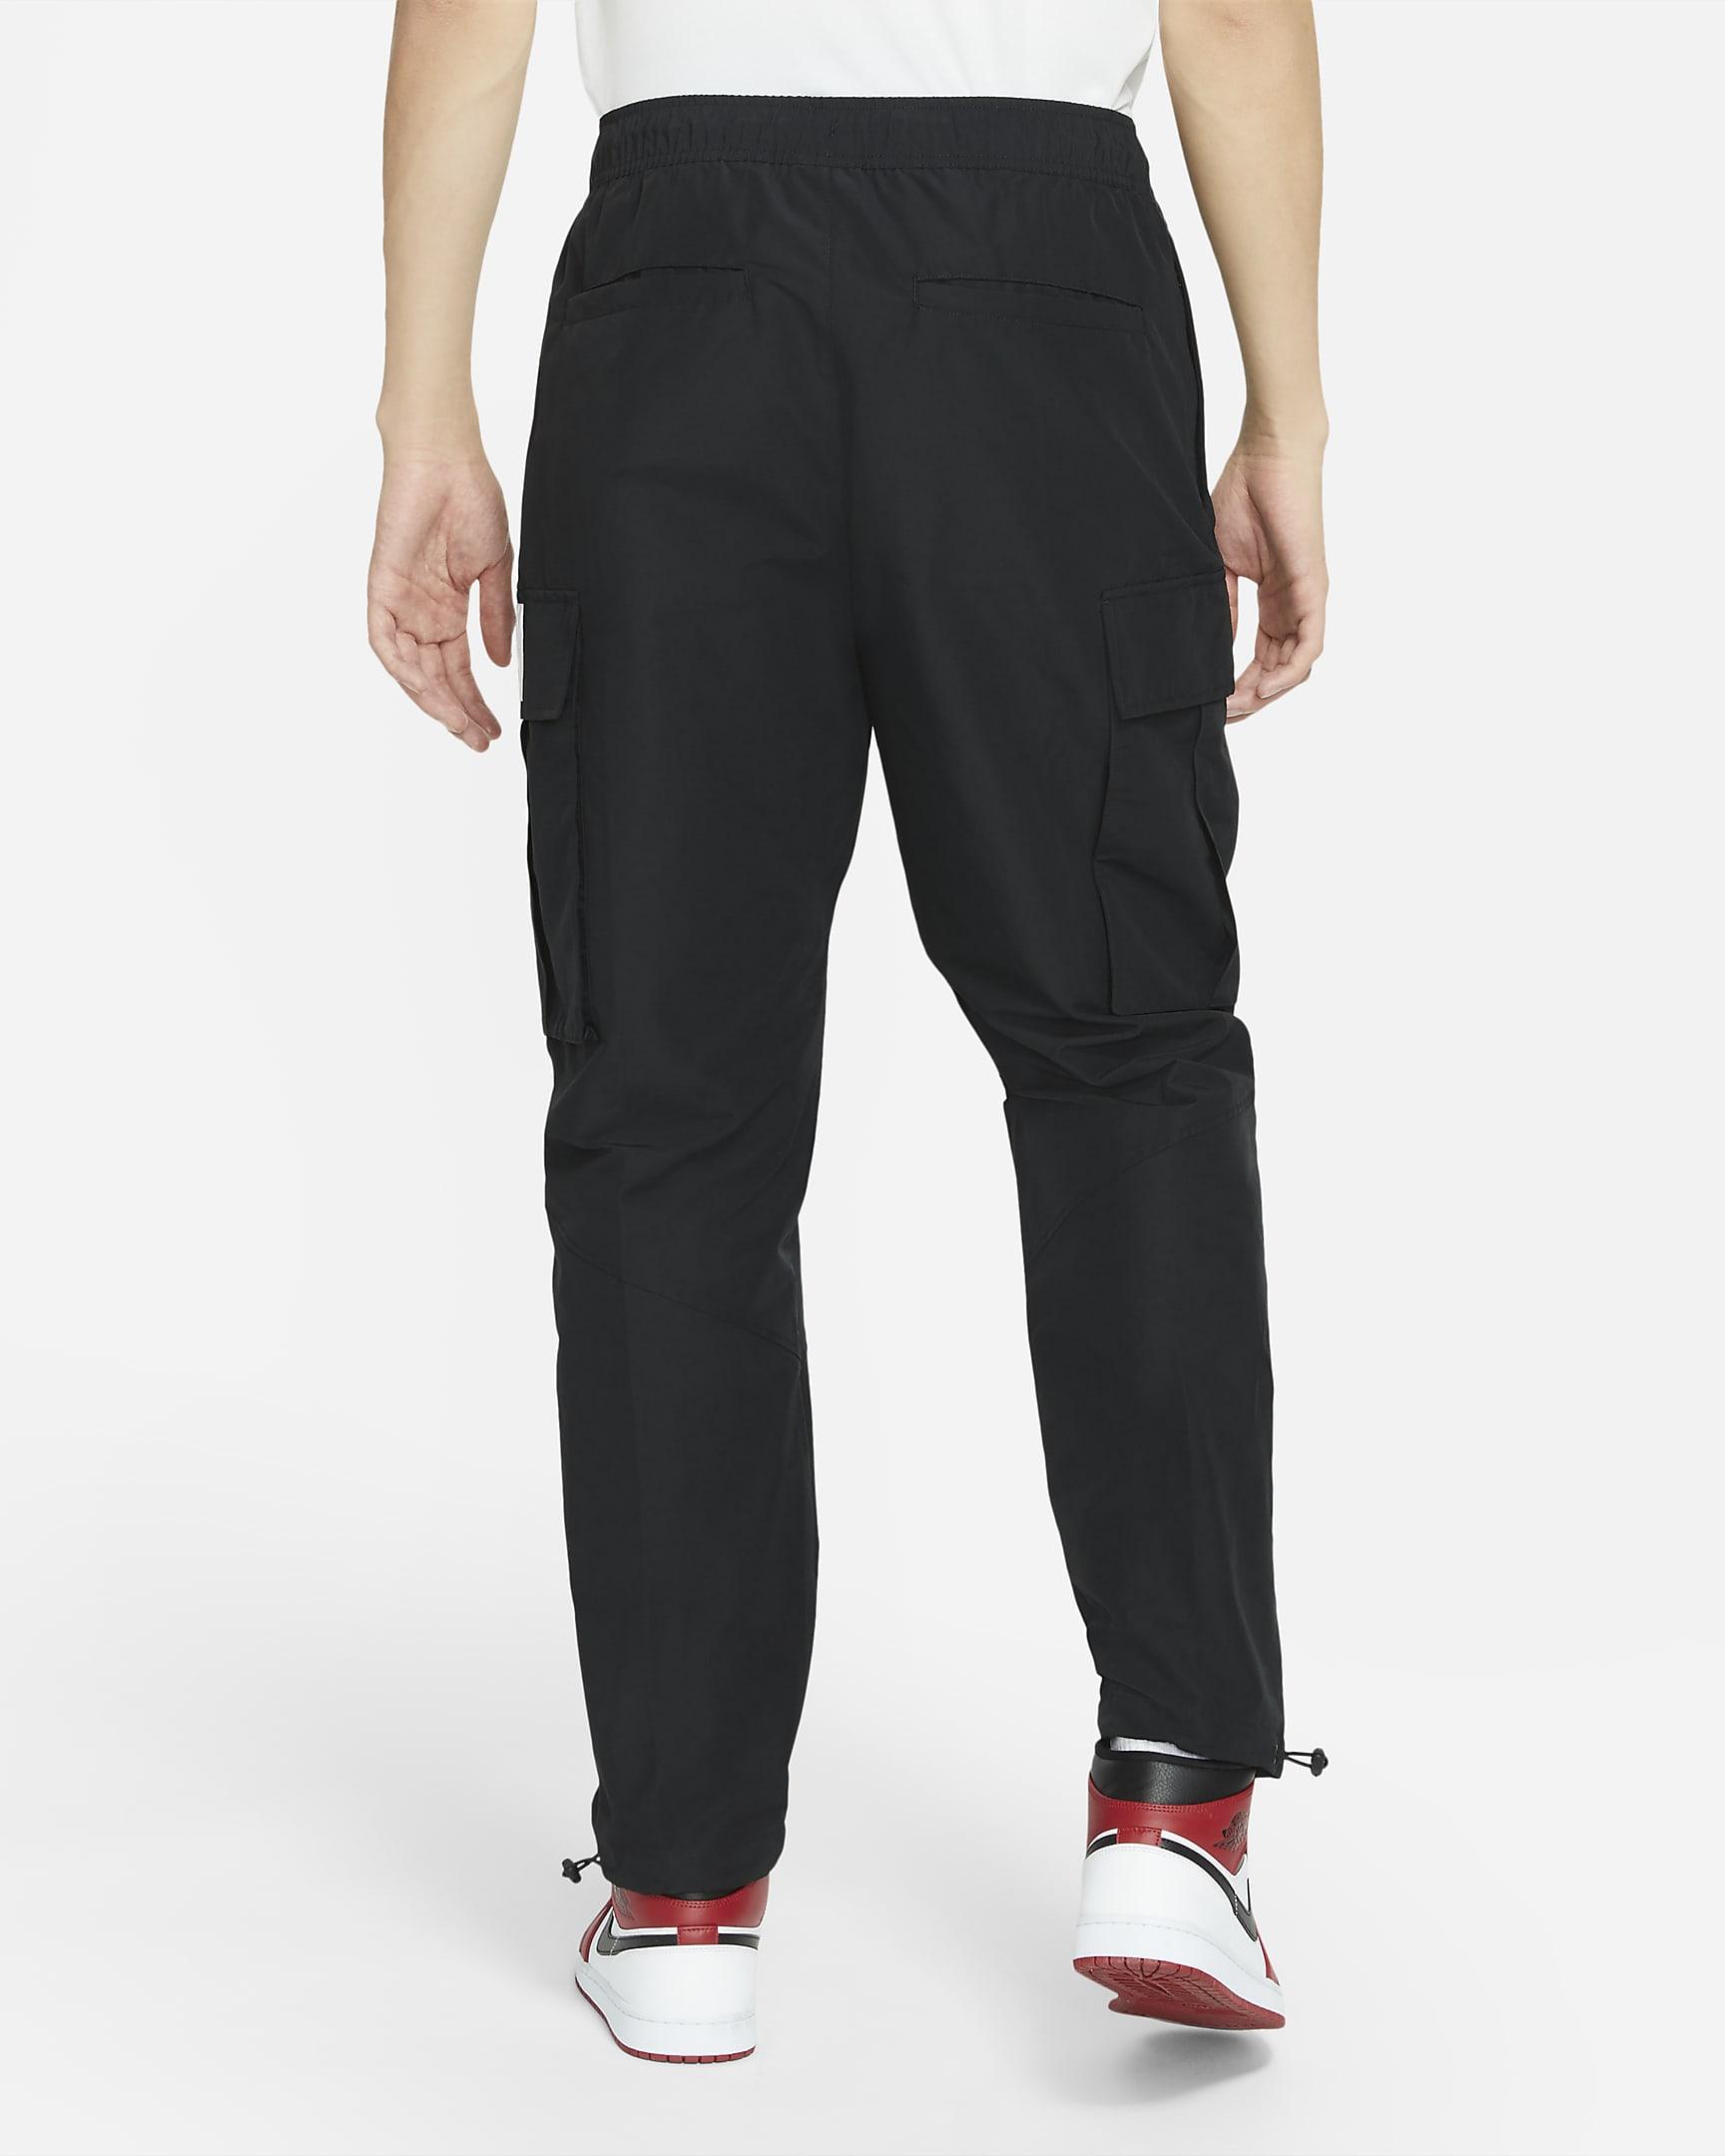 jordan-flight-mens-woven-pants-plT7Sv-1